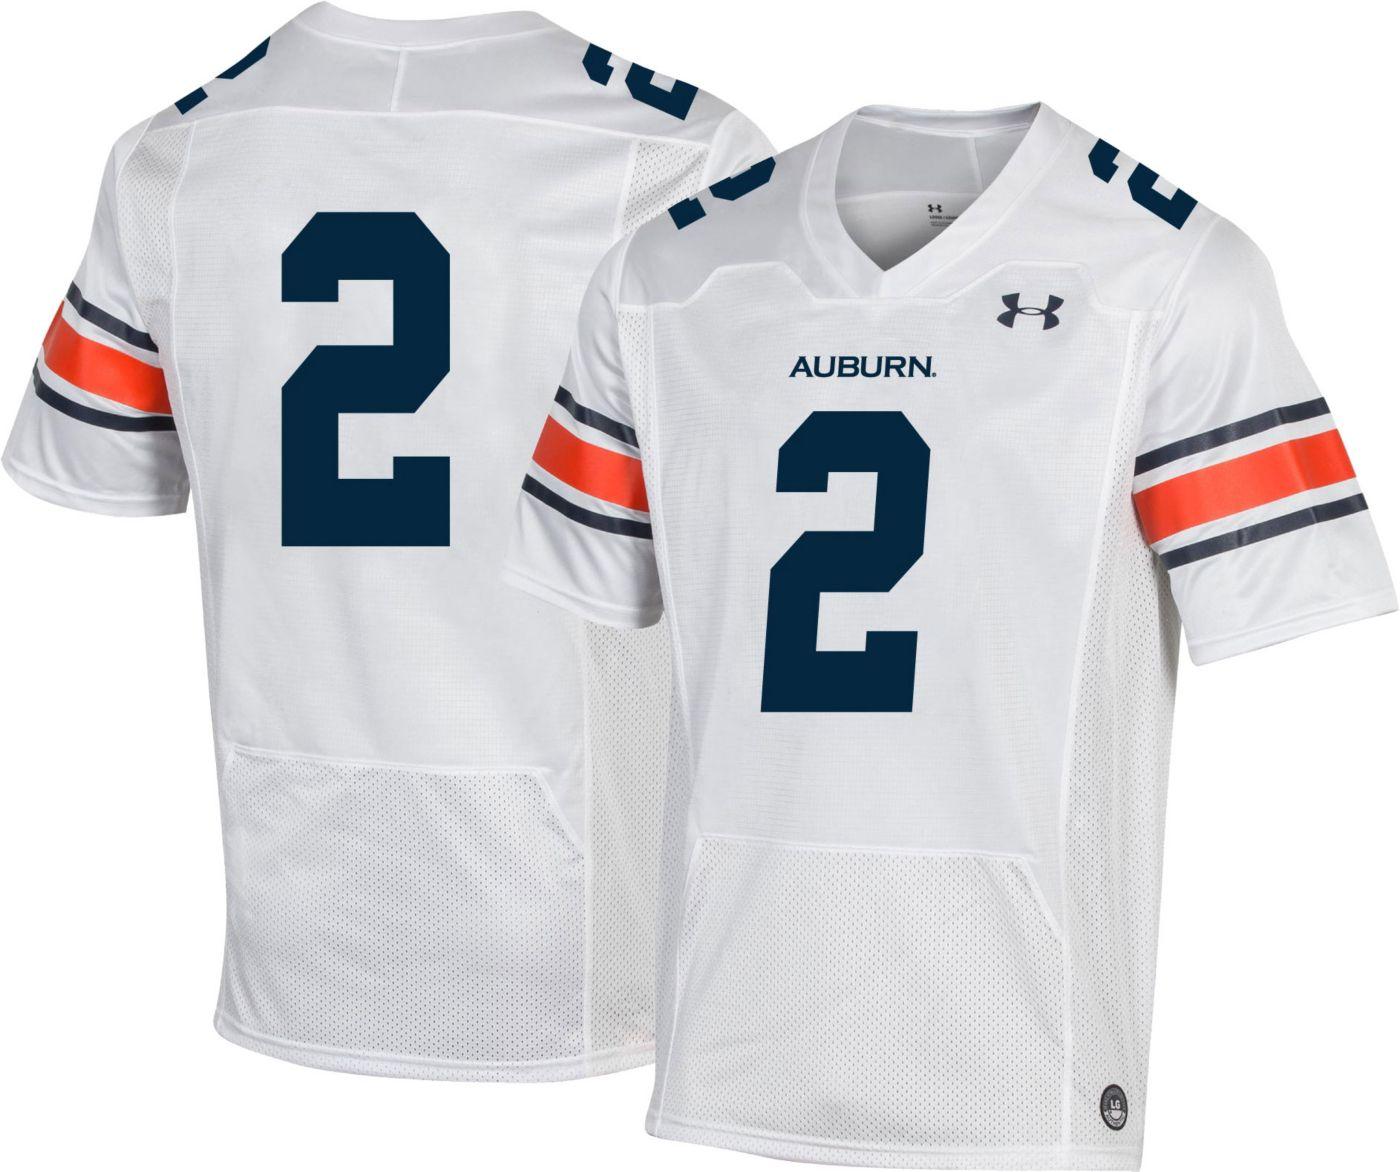 Under Armour Men's Auburn Tigers #2 Replica Football White Jersey 1